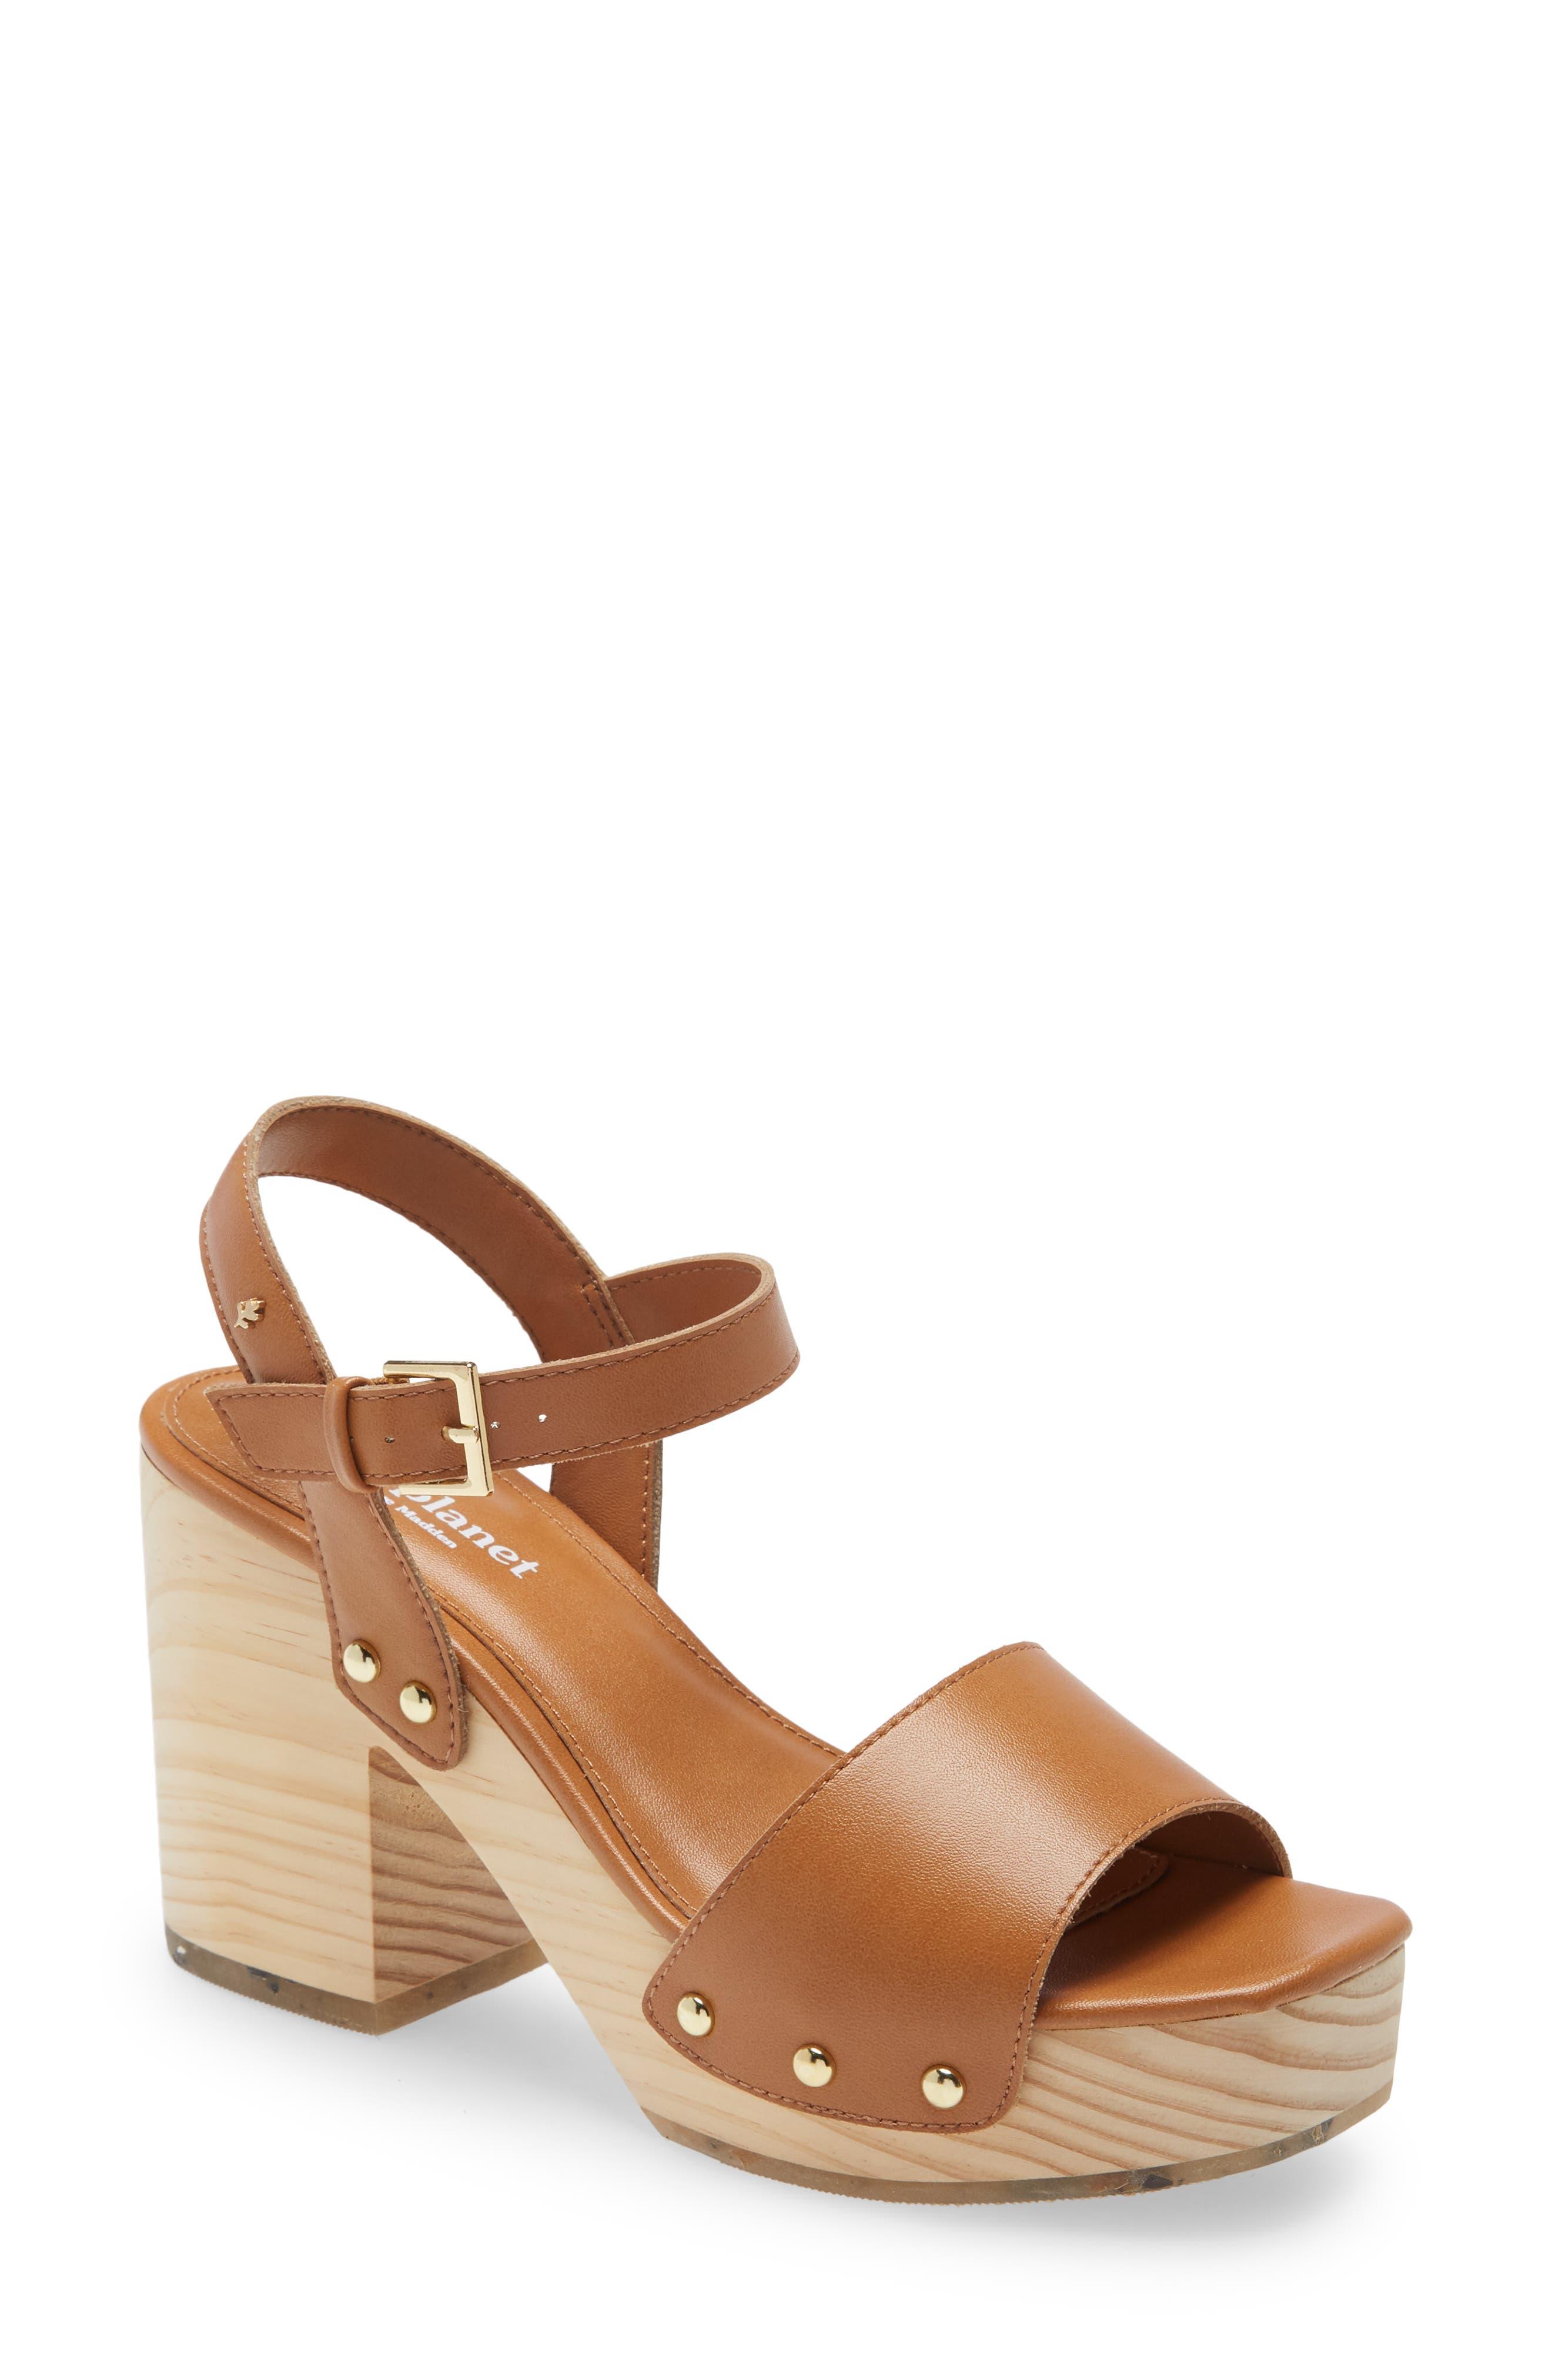 Rubyy Platform Sandal